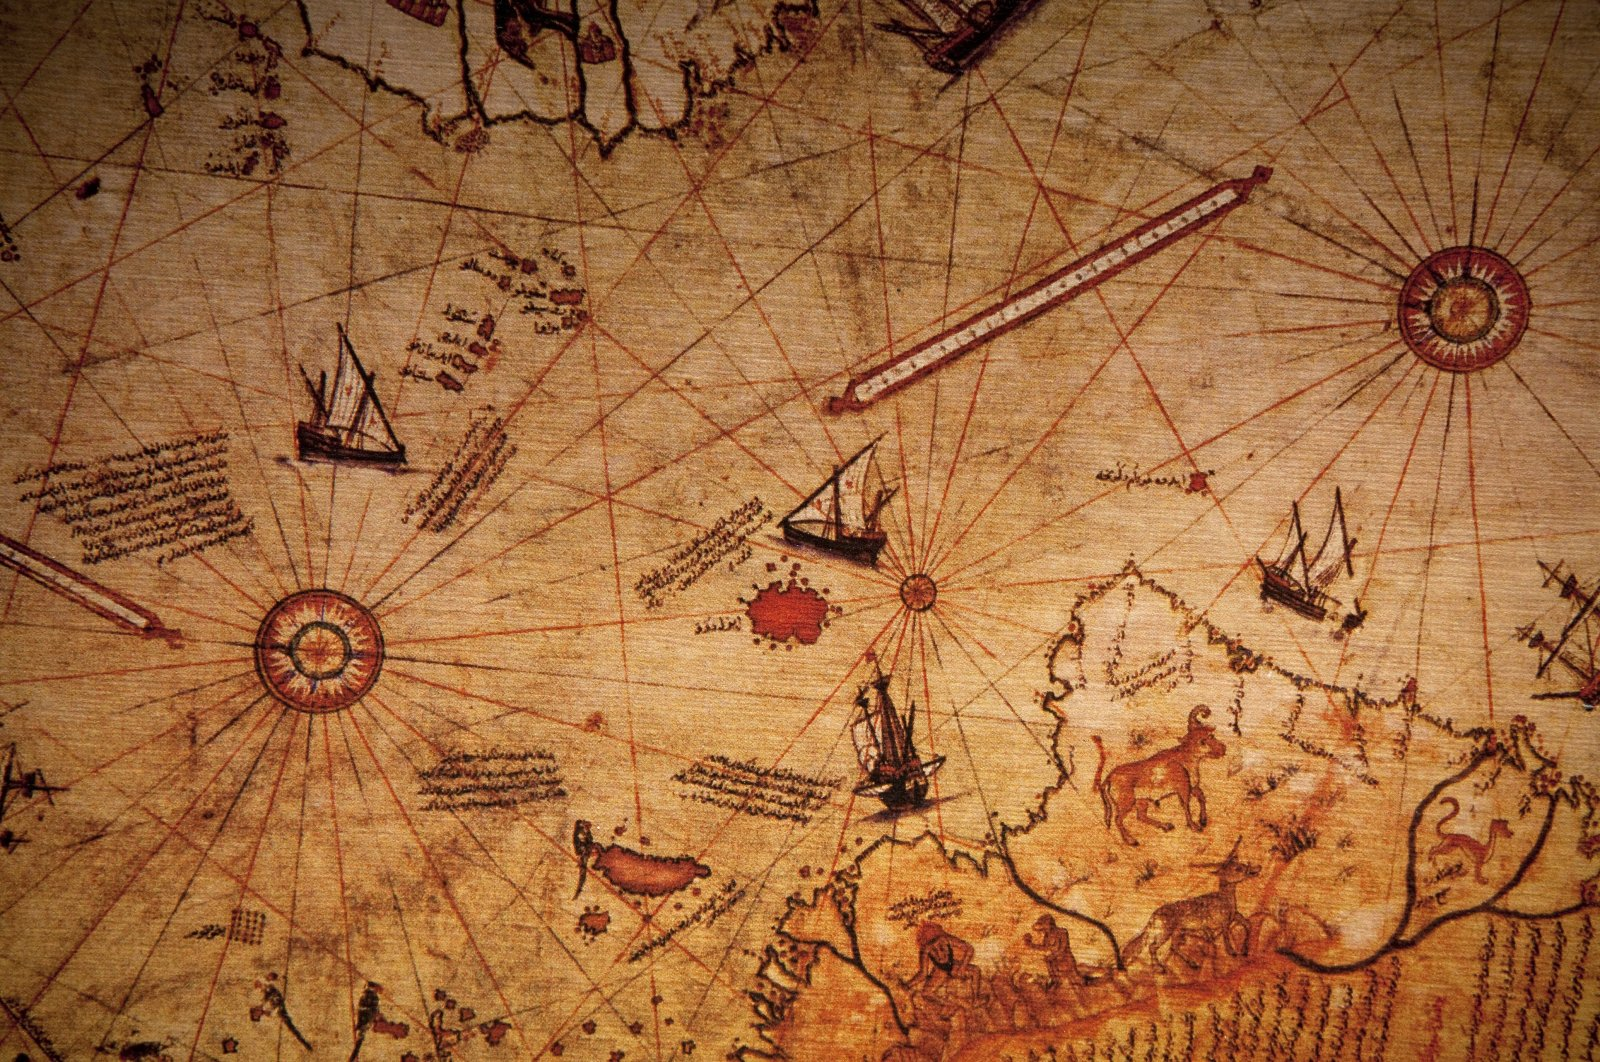 Full-frame view of Piri Reis' world map. (iStock Photo)